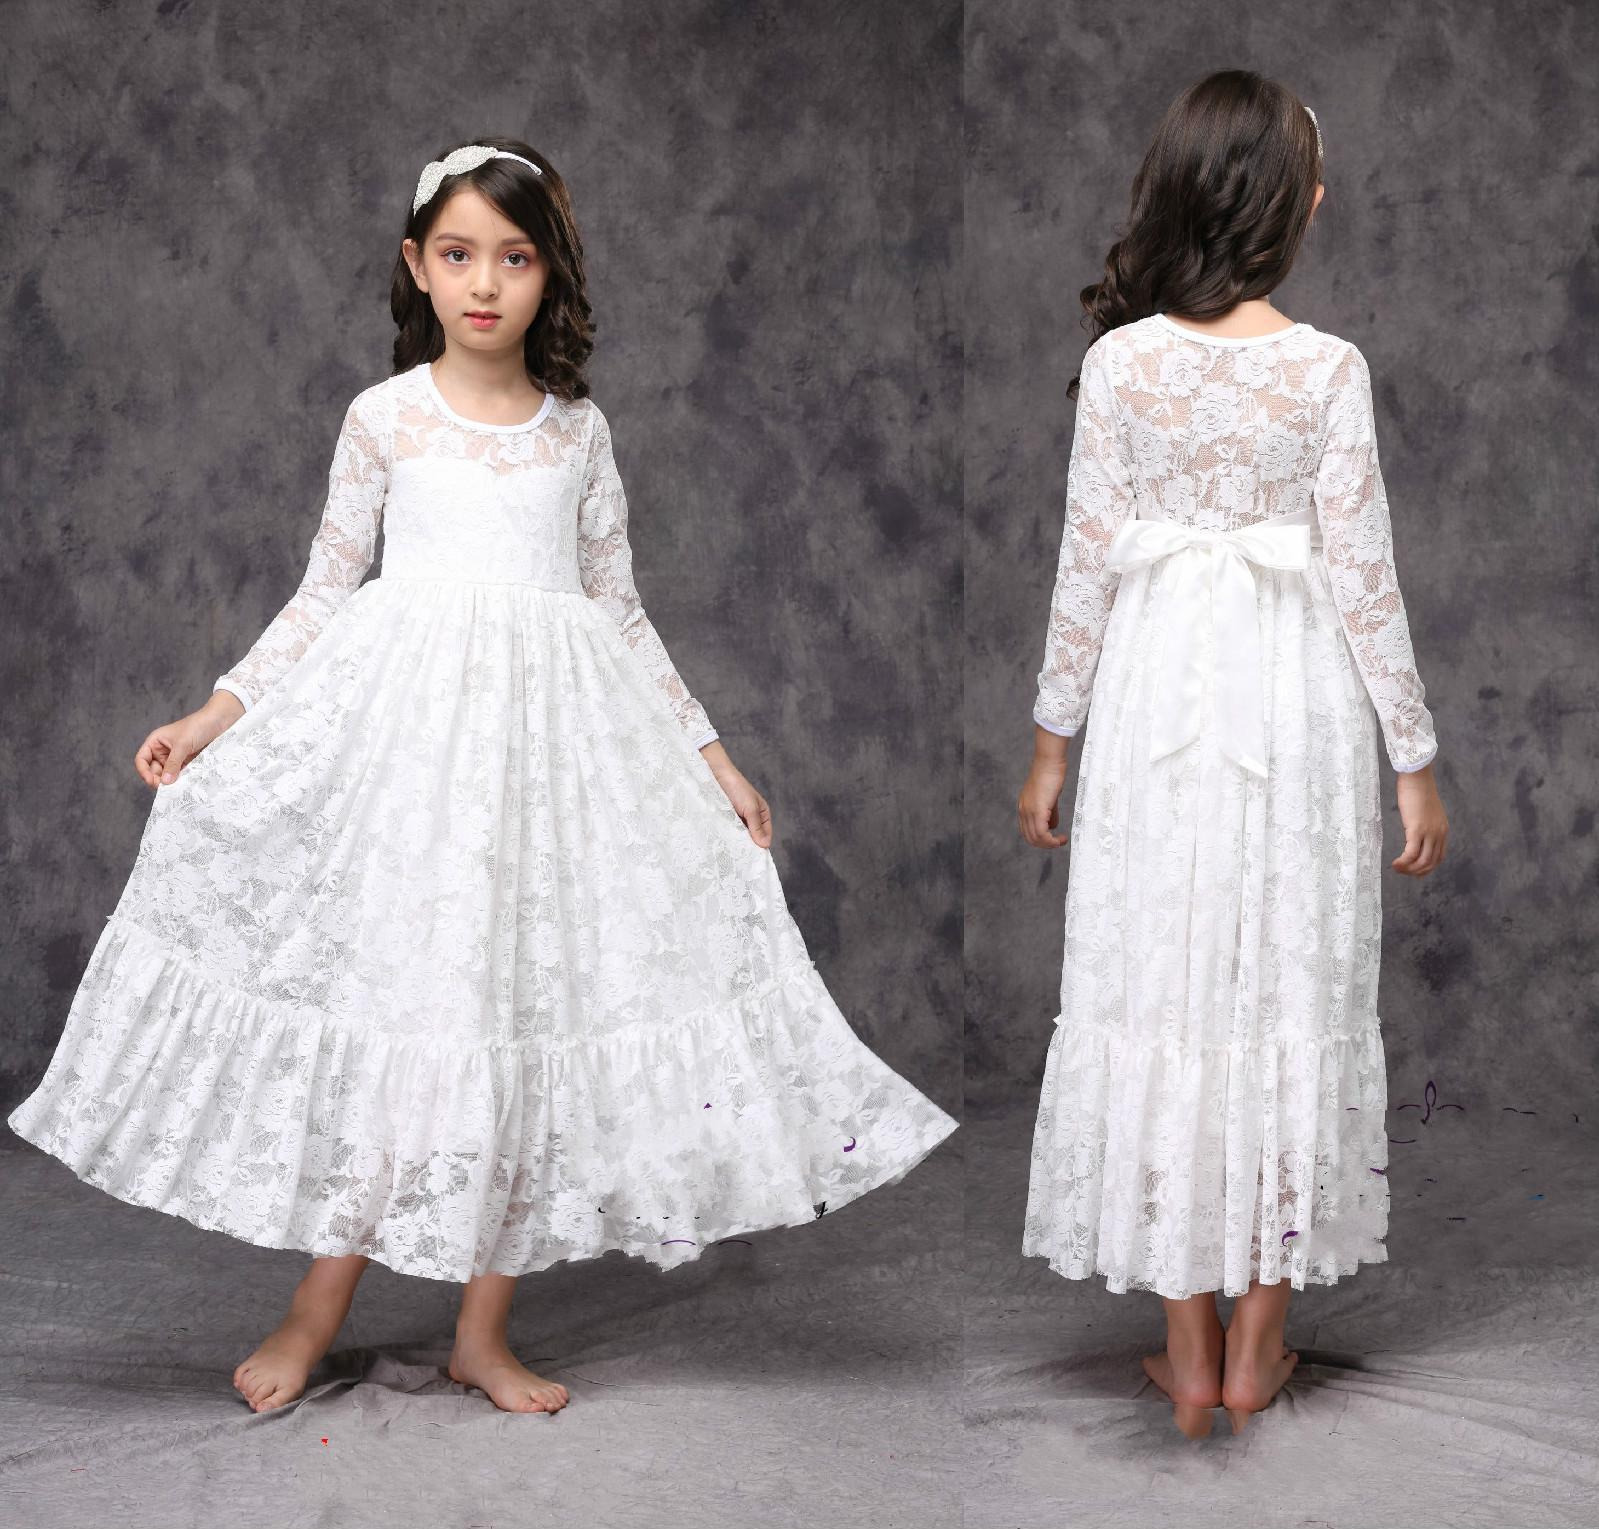 830710399e0 White Ivory Flower Girl Dress Little Baby Lace Dress First Communion Dress  Bridesmaid Wedding Party Long Sleeve Custom Size Flower Girl Dresses  Ireland ...